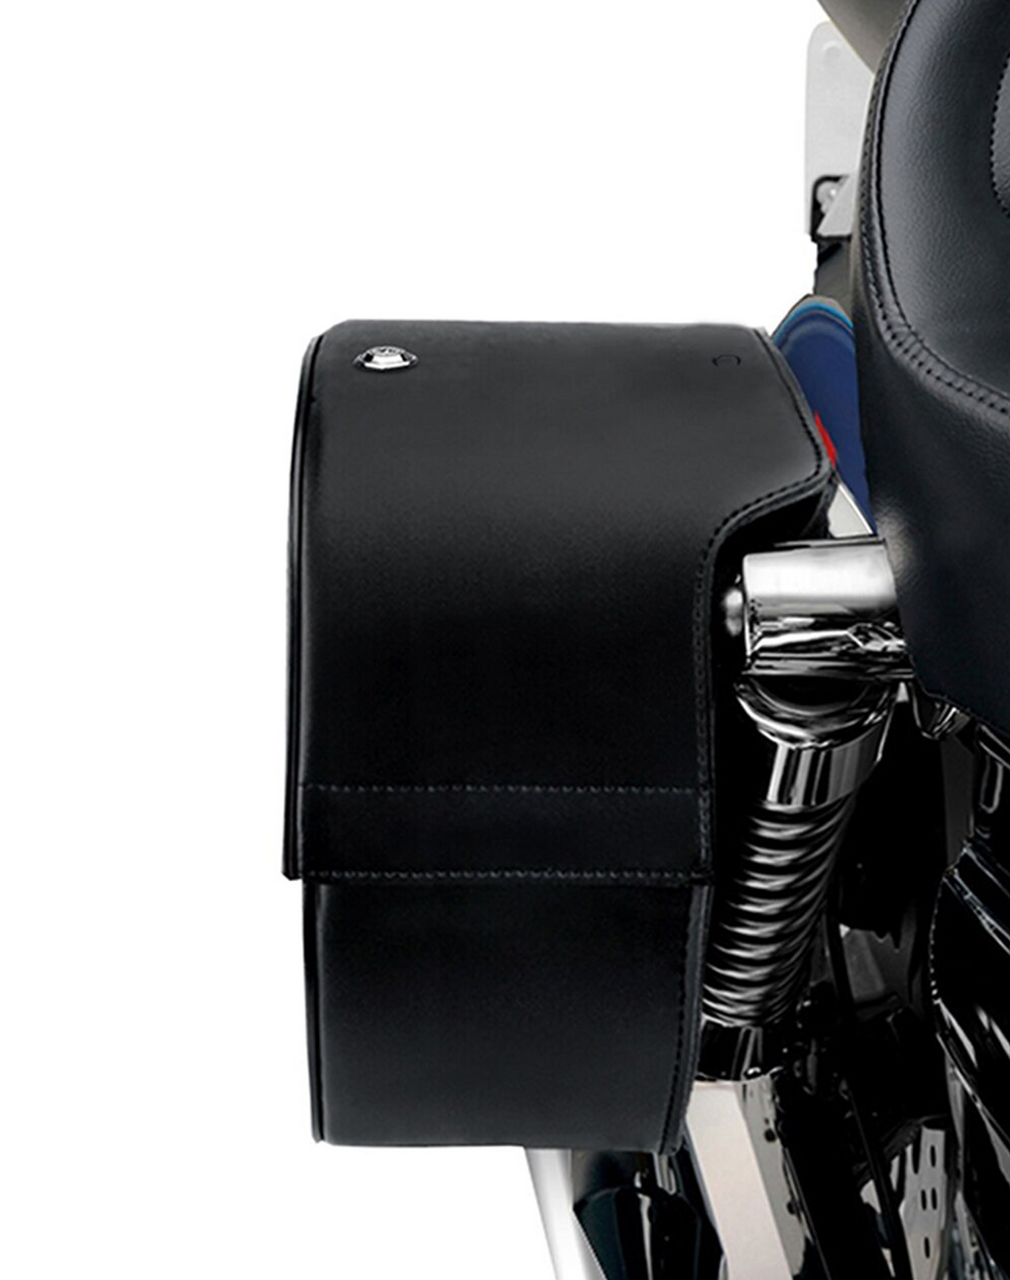 Honda 750 Shadow Phantom Large SS Shock Cutout Slanted Motorcycle Saddlebags shock cutout view